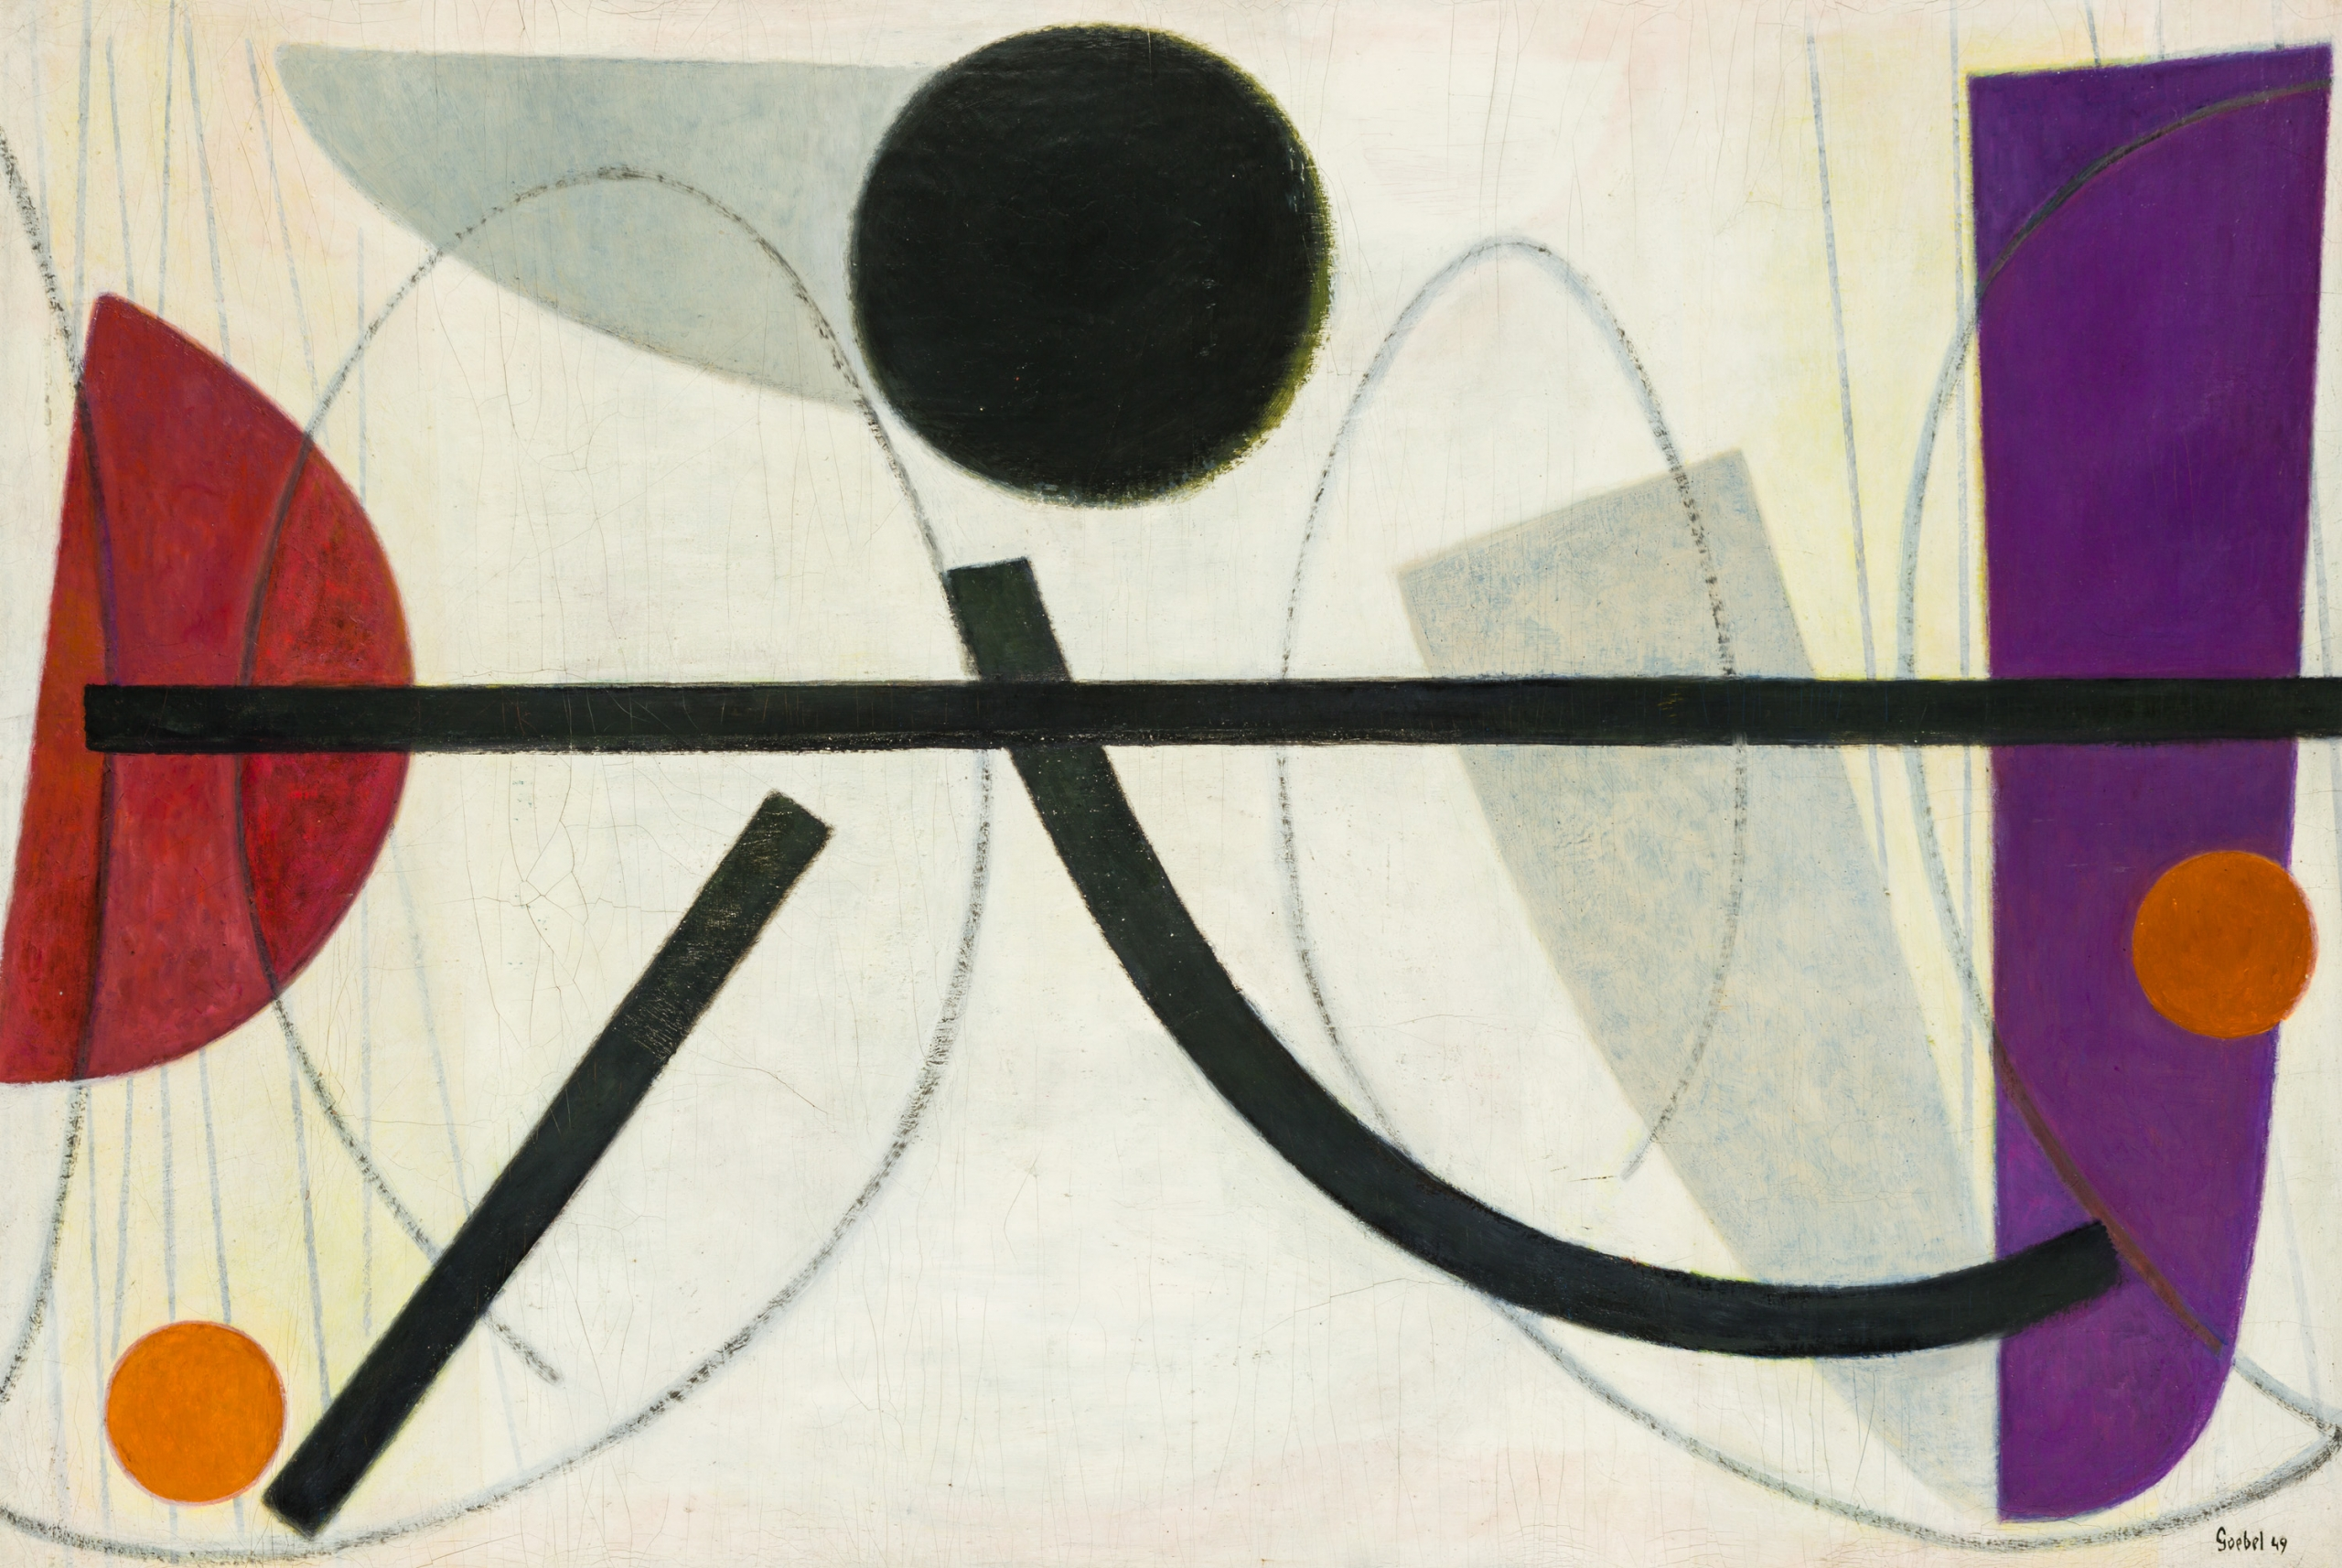 Gottfried Goebel, Komposition